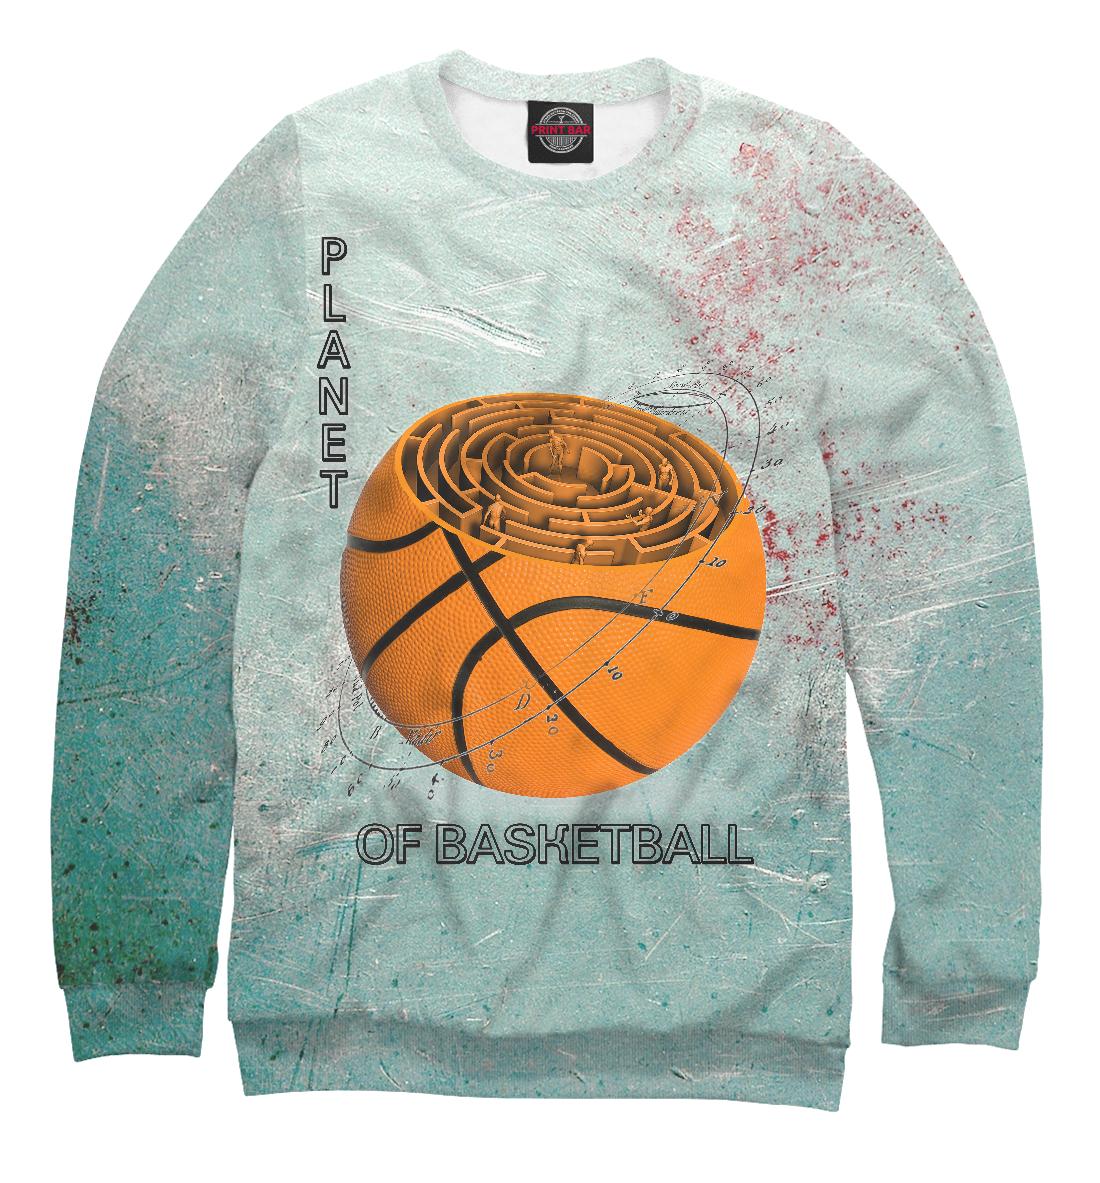 Купить Баскетбол, Printbar, Свитшоты, NBA-389991-swi-1